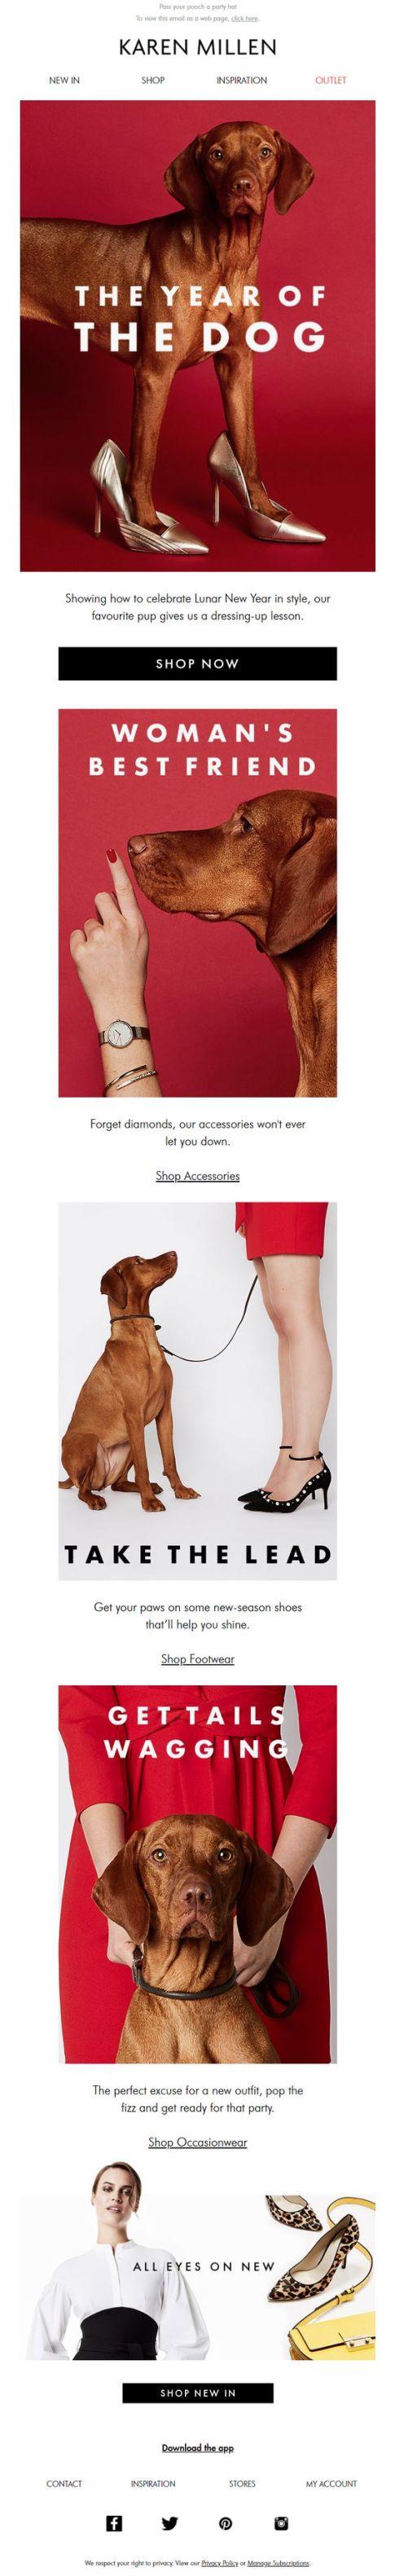 Year of the Dog New Year #Emma #NewYear #email #Marketing #ad